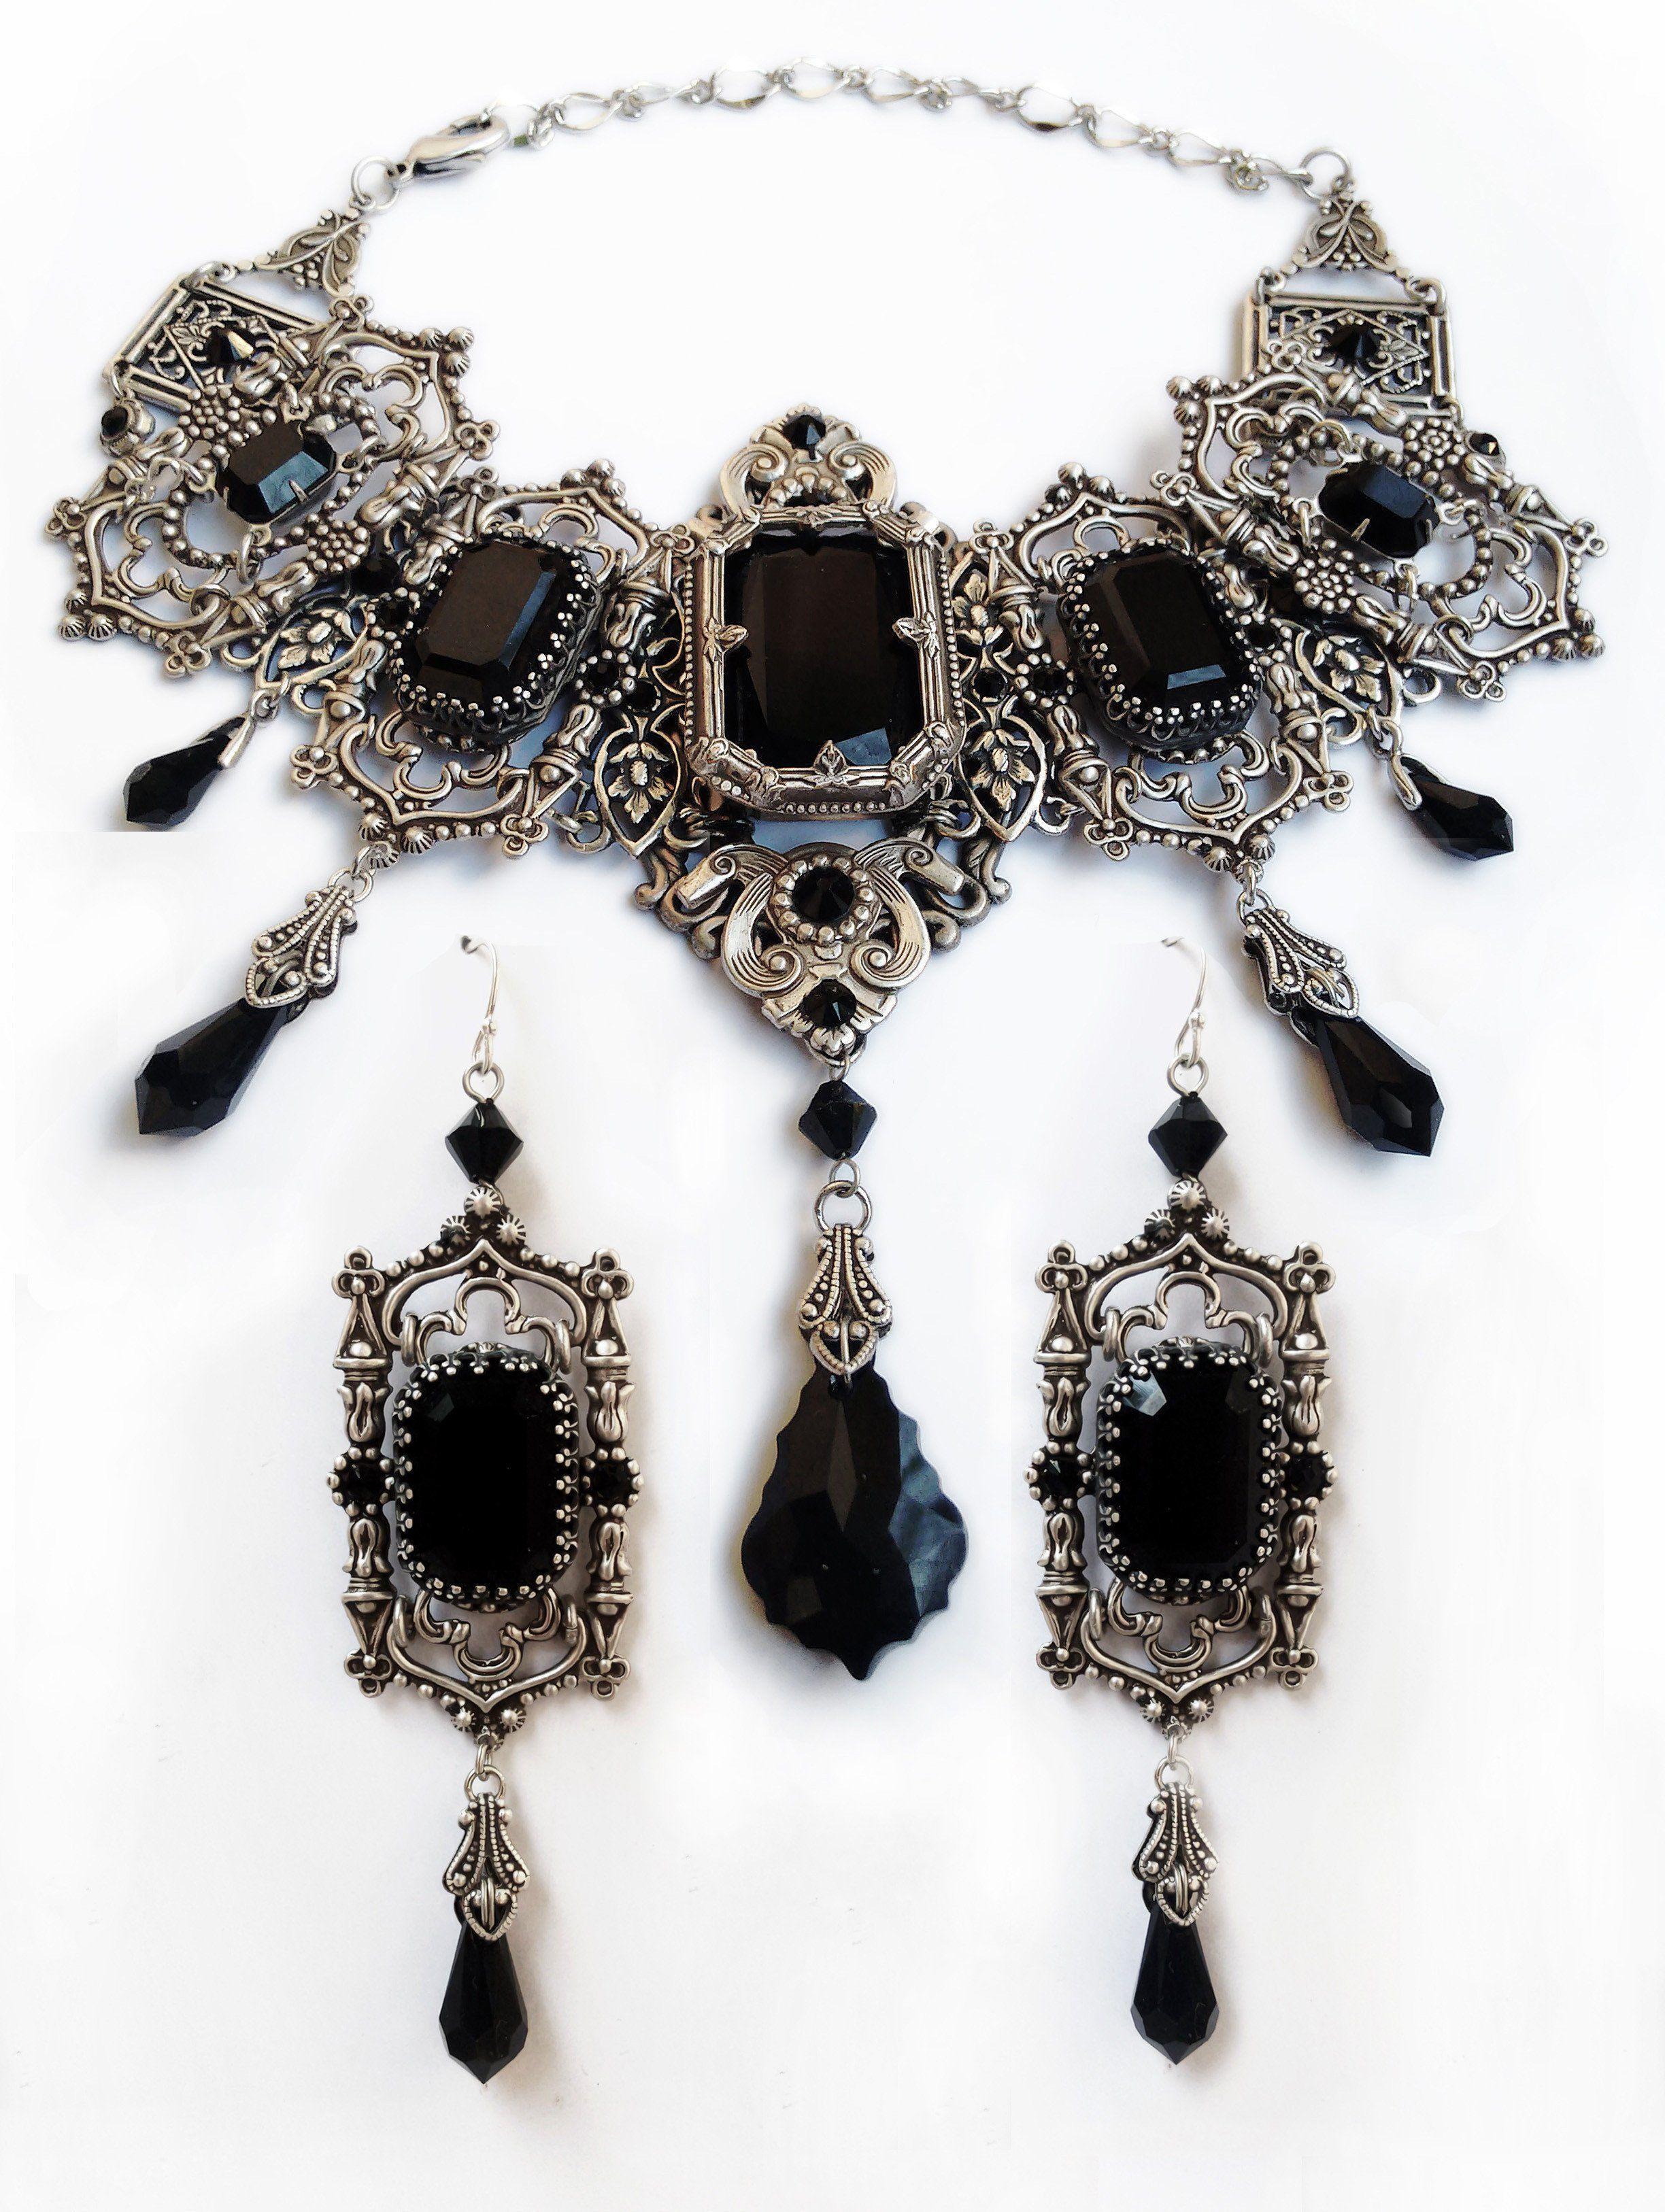 ed55e4d4ebc22 Grand Gothic Jewelry Set in 2019 | dark wear | Gothic jewelry ...